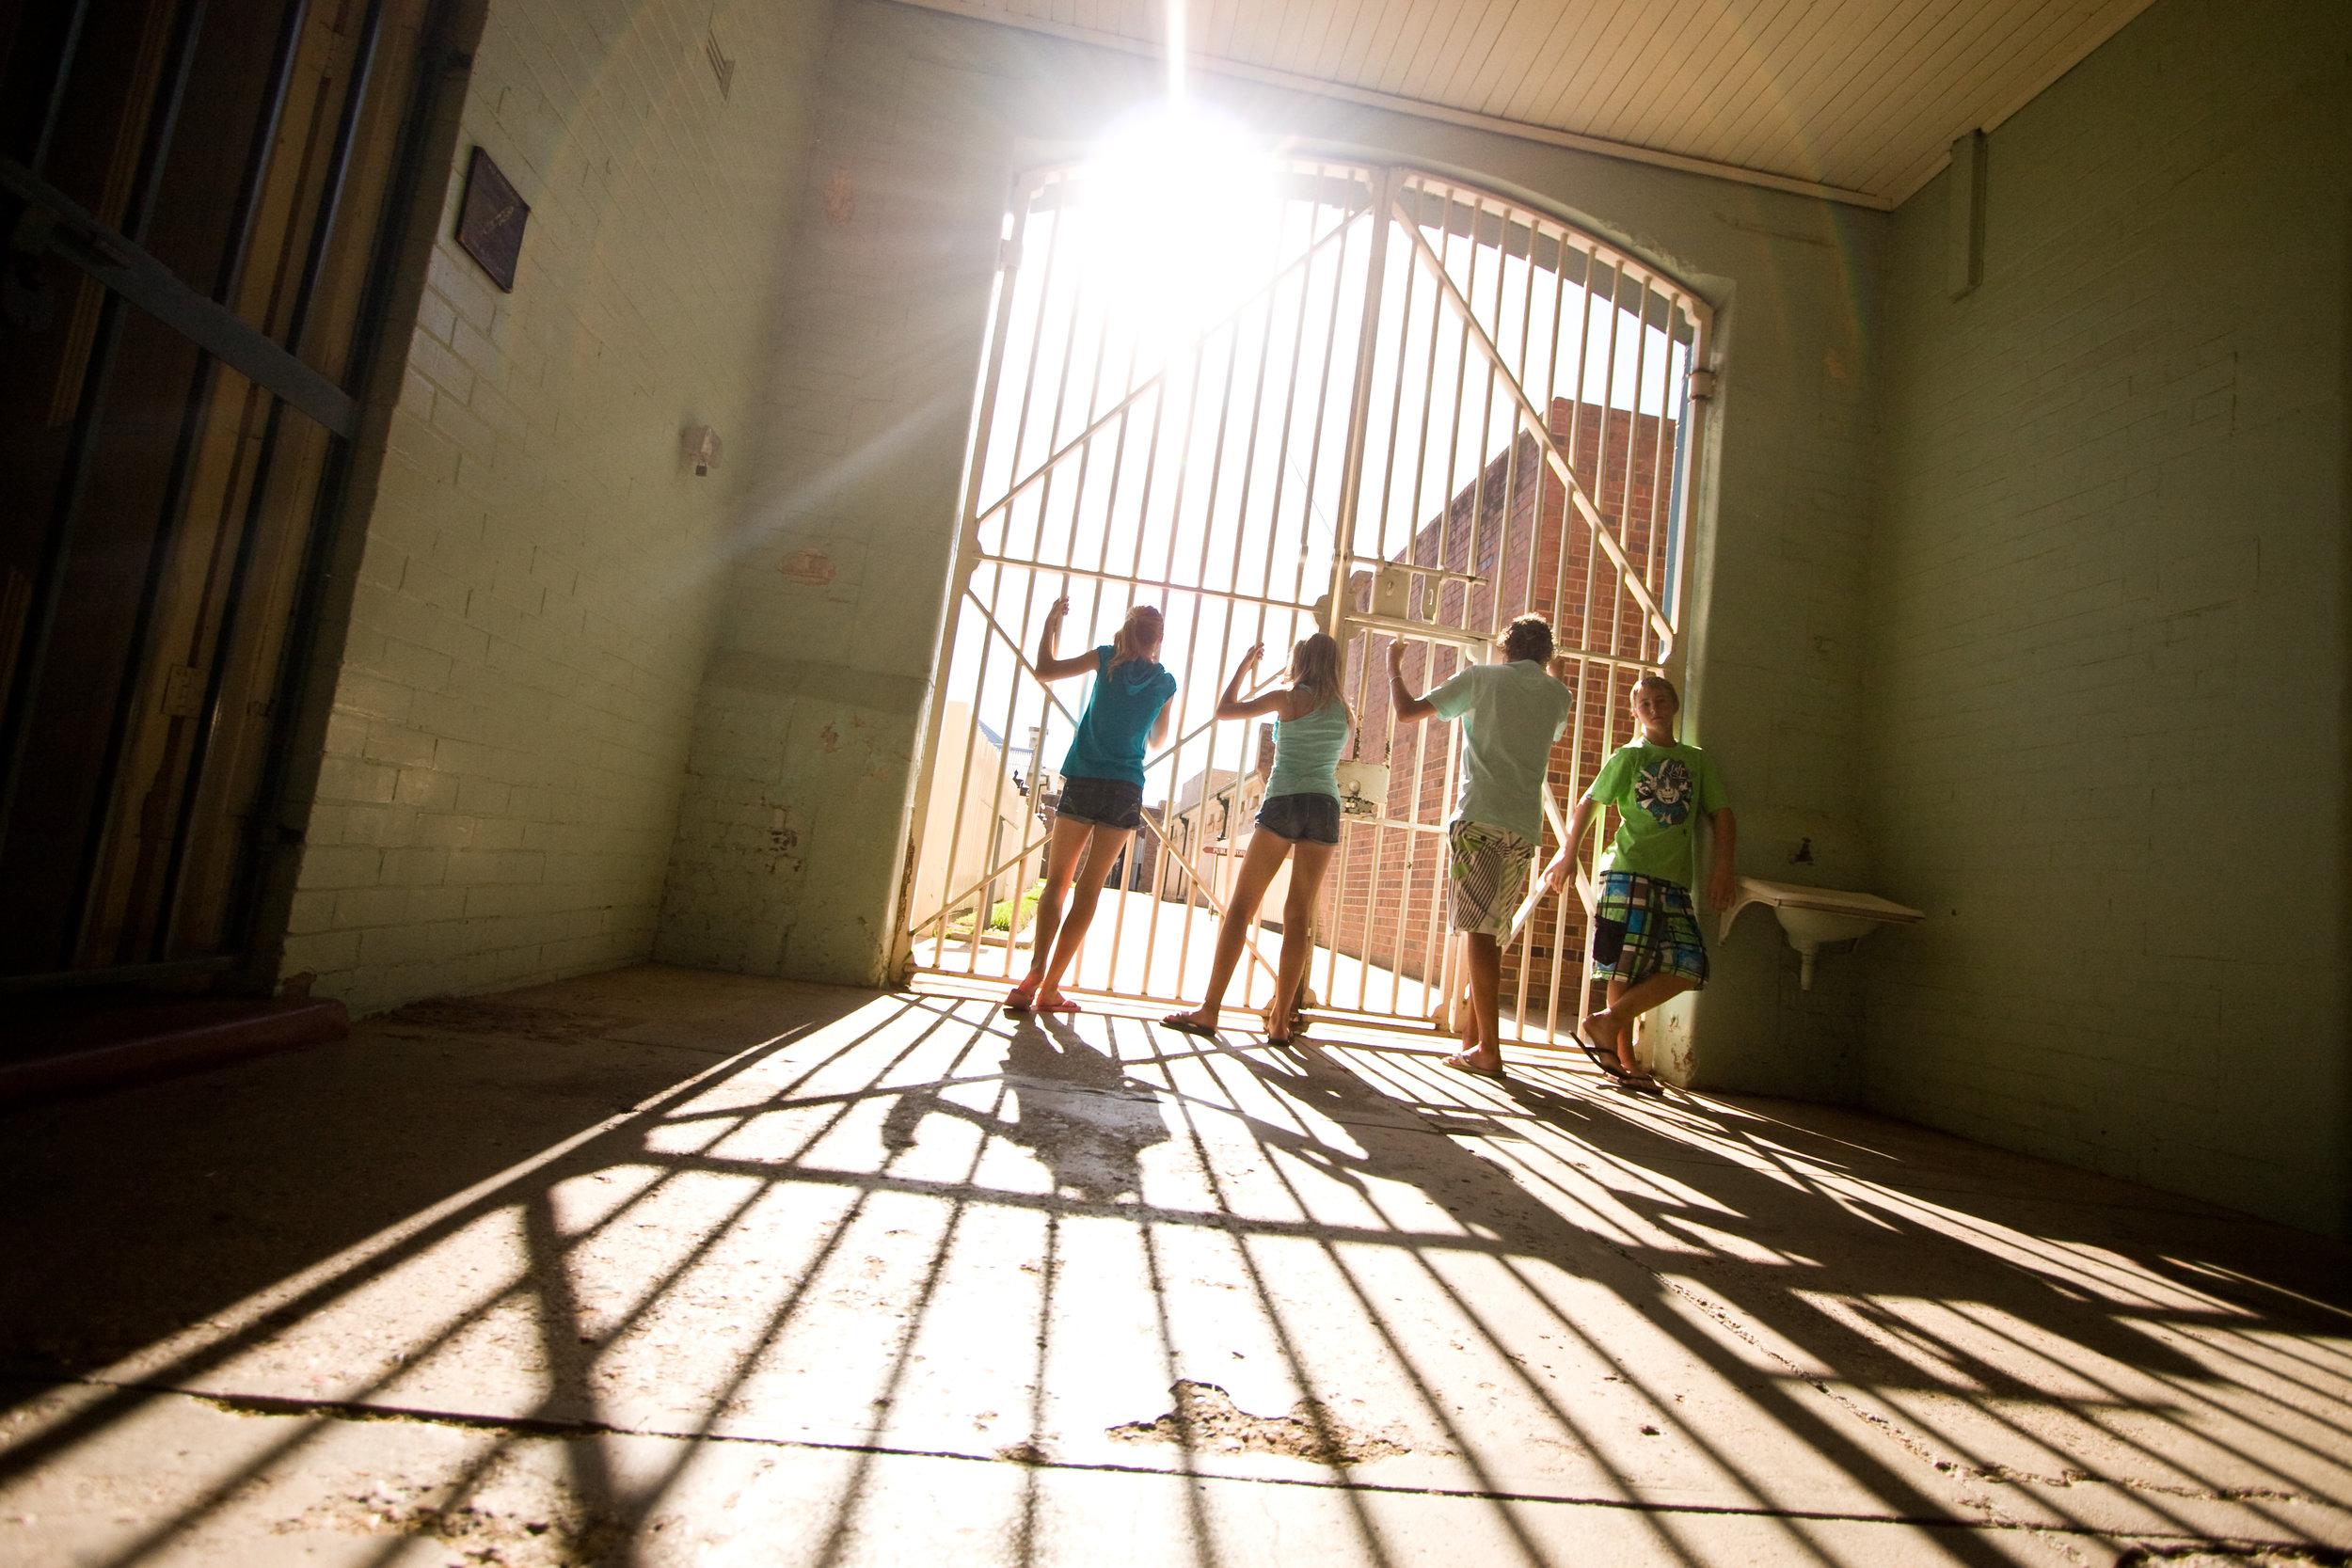 Old_Dubbo_Gaol_behind_bars (1).jpg